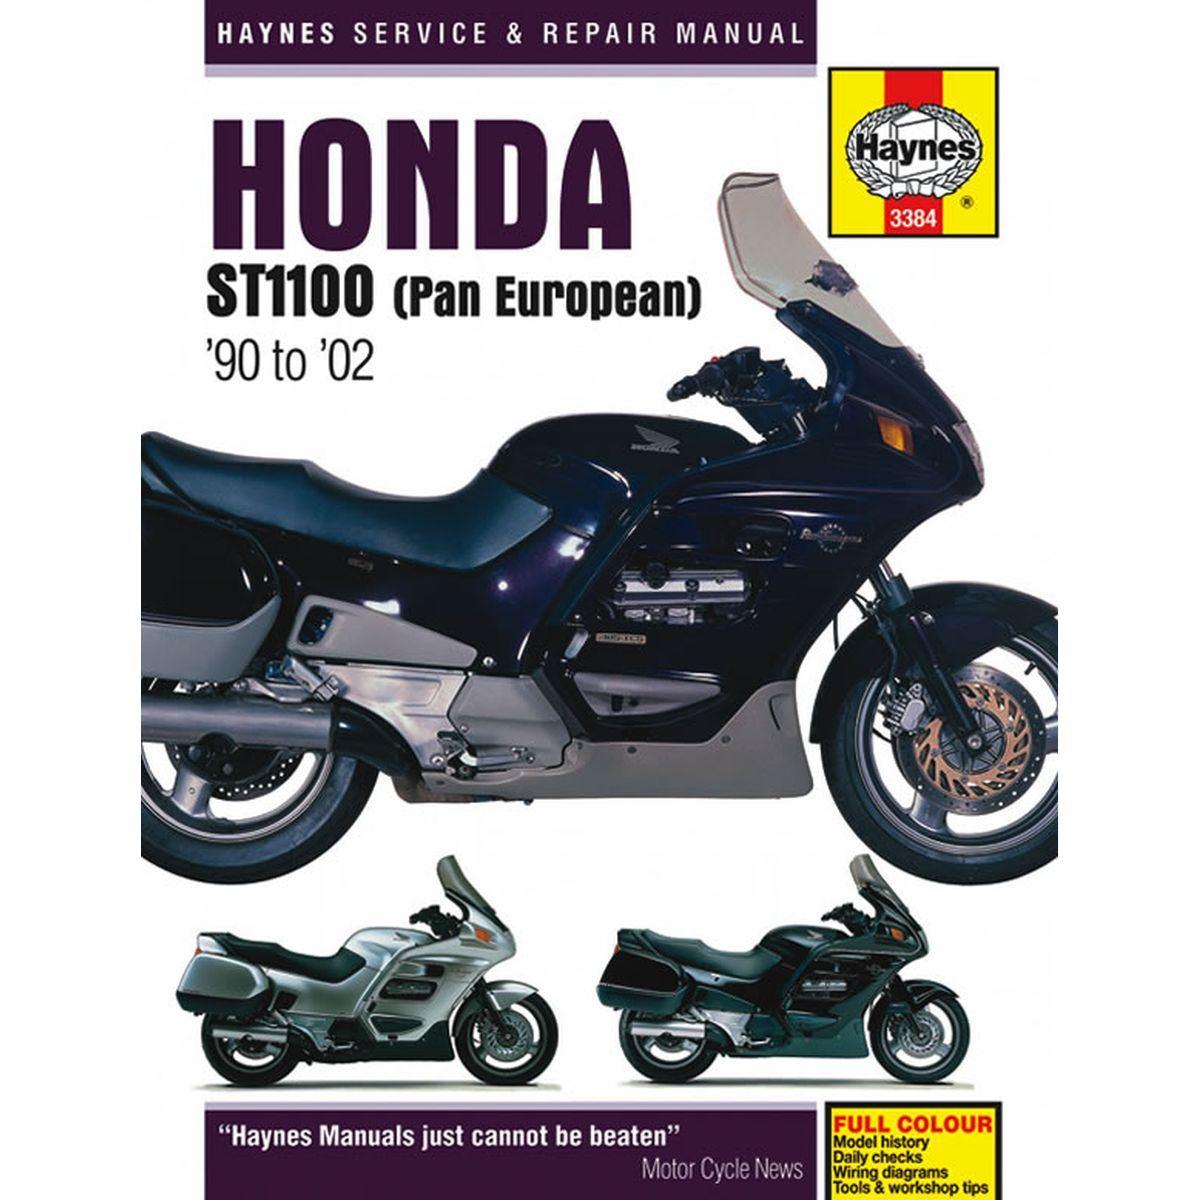 Manual-Haynes-for-1995-Honda-ST-1100-AS-Pan-European-ABS-TSC